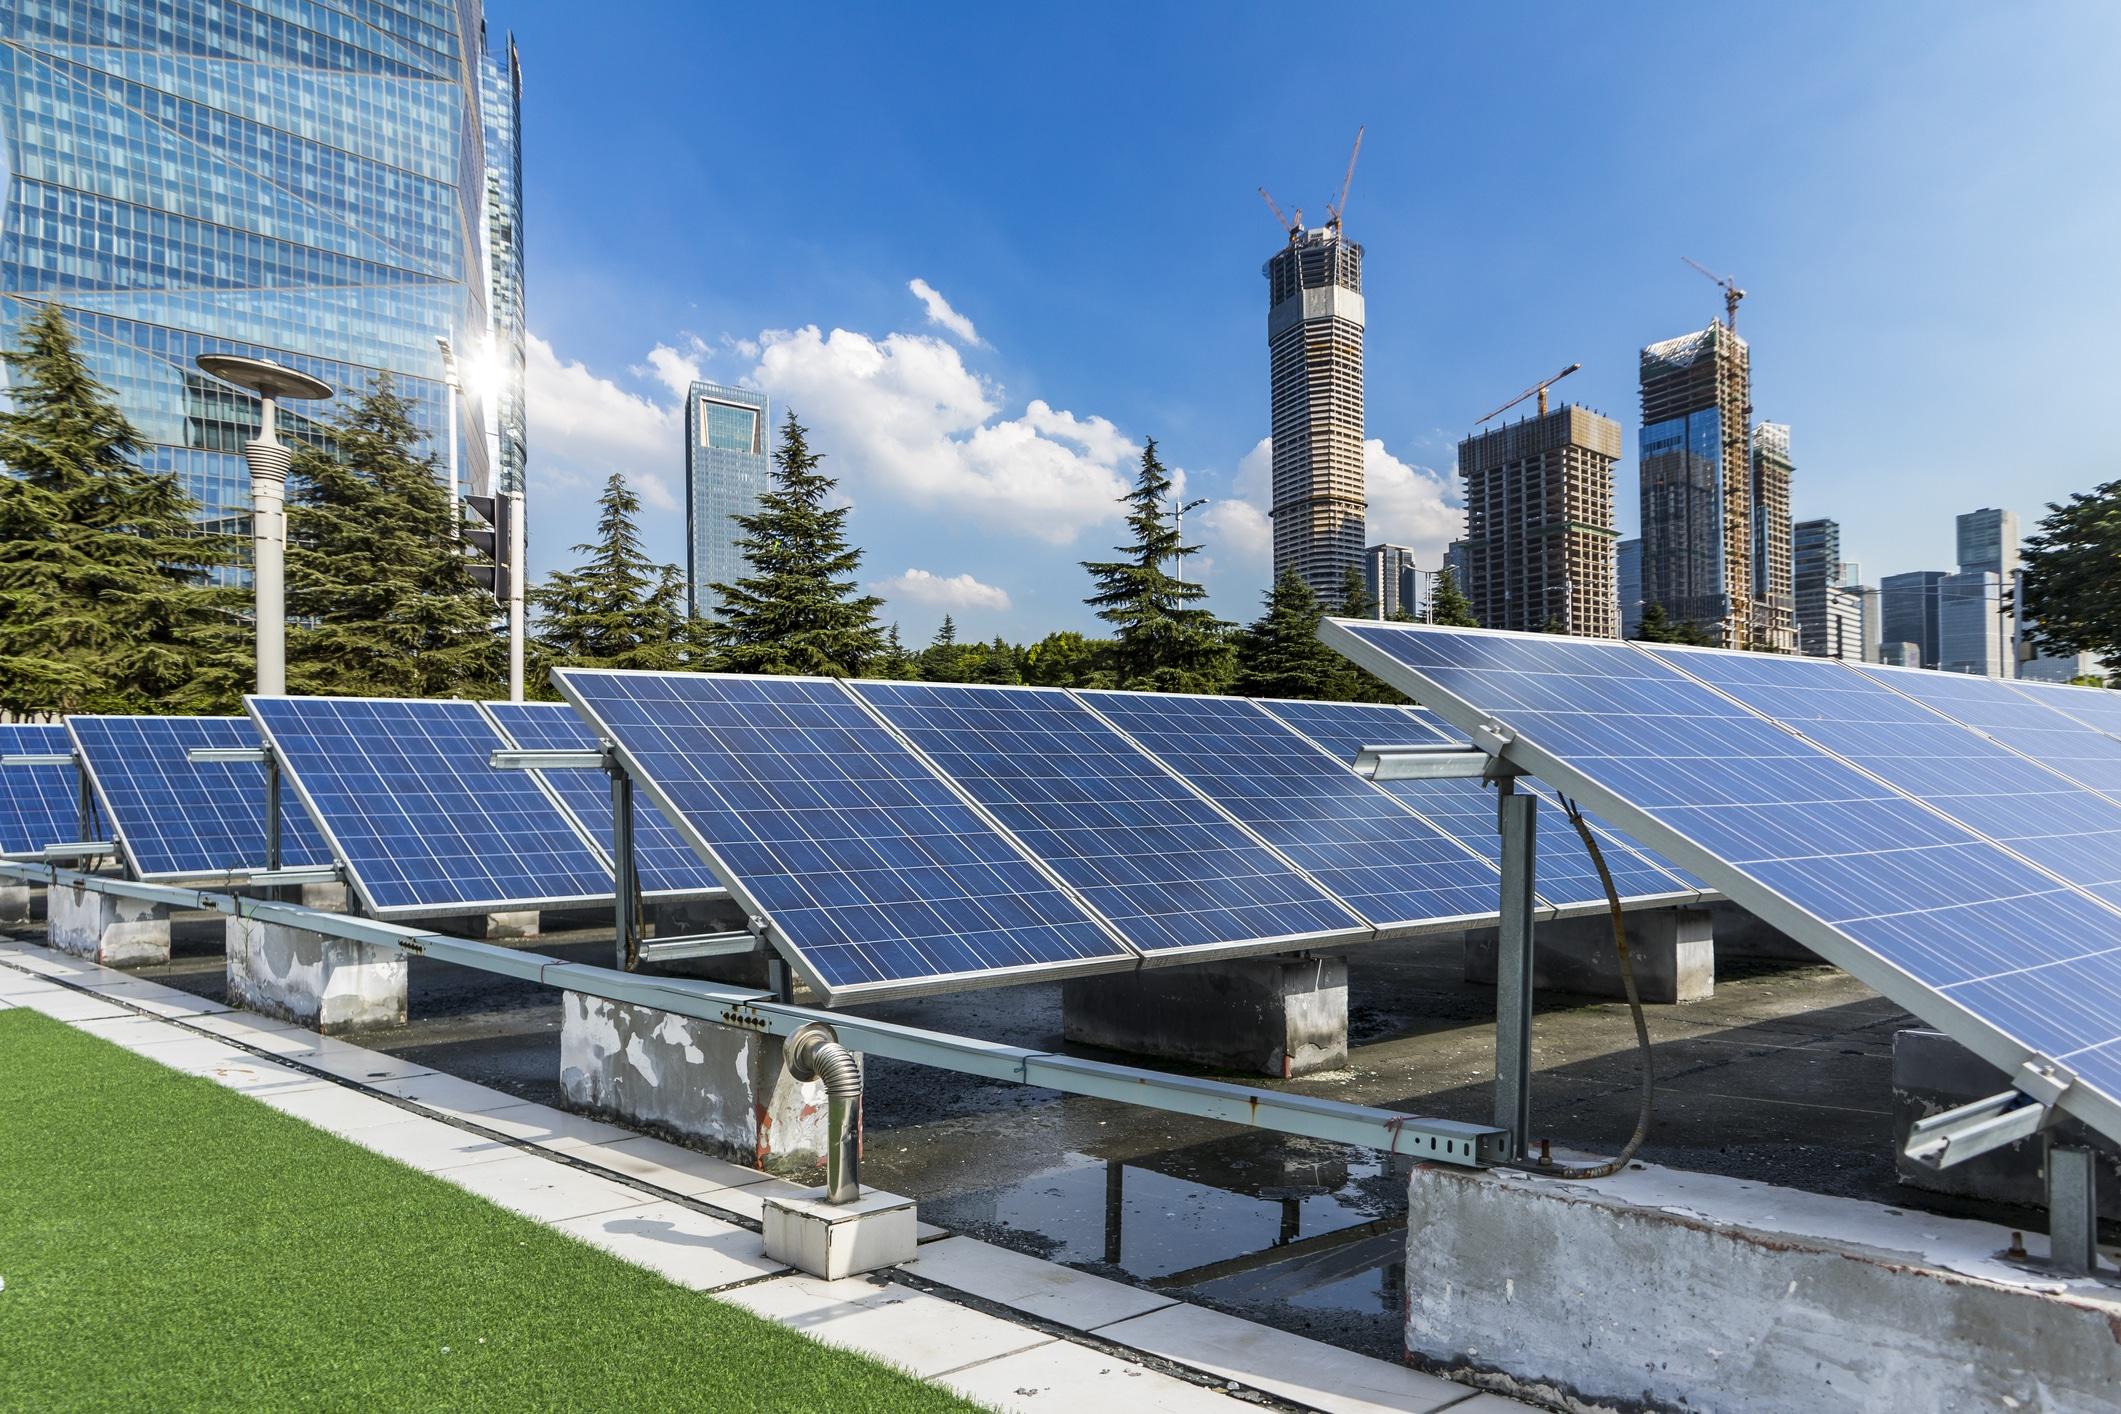 nyc solar installer quixotic systems designs vertical - HD2121×1414